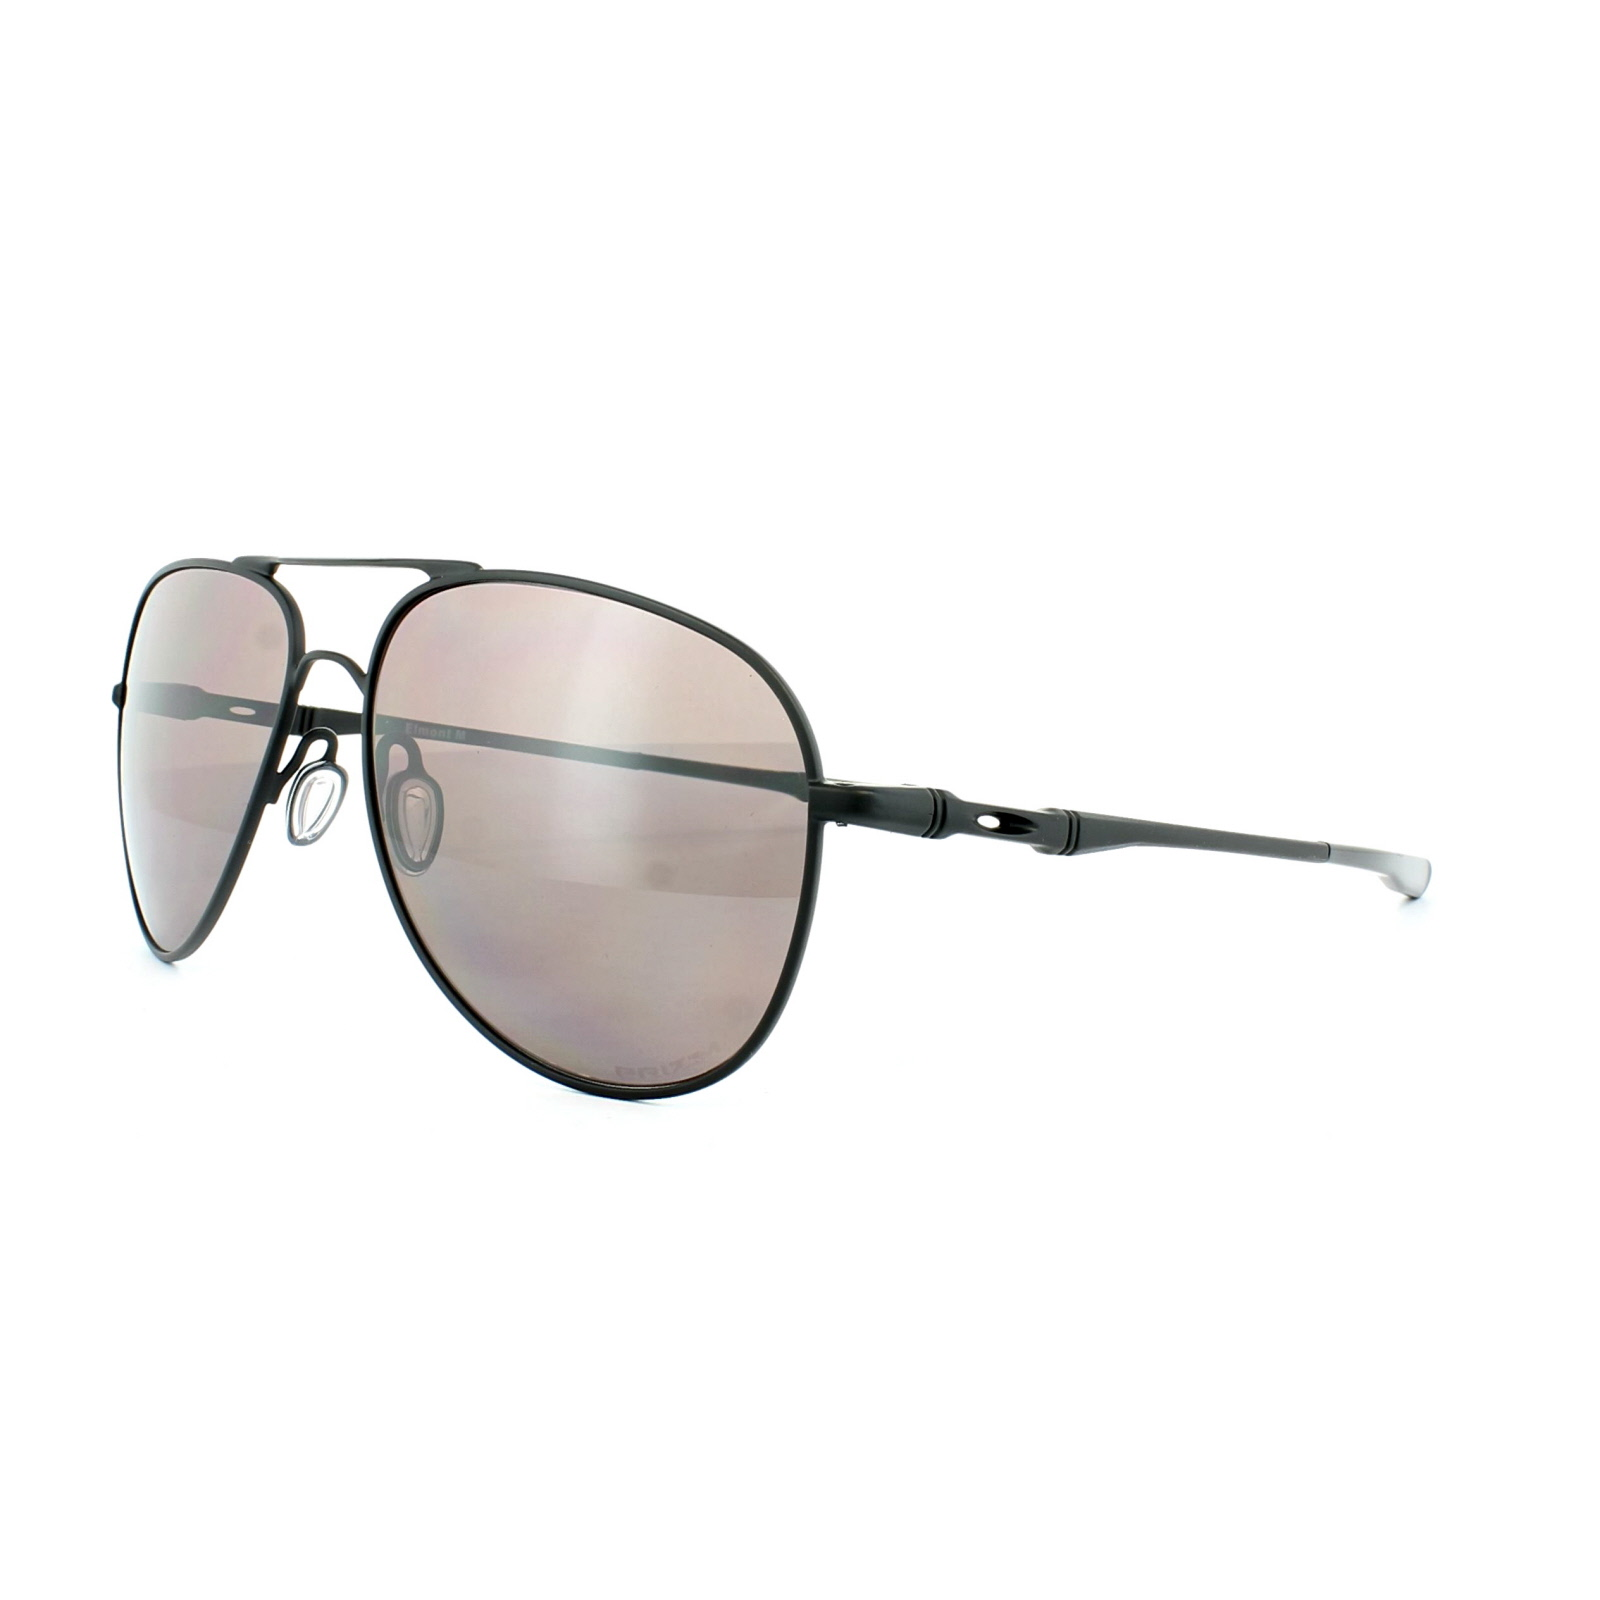 32d4f55e86 Sentinel Oakley Sunglasses Elmont M OO4119-05 Matt Black Prizm Daily  Polarized